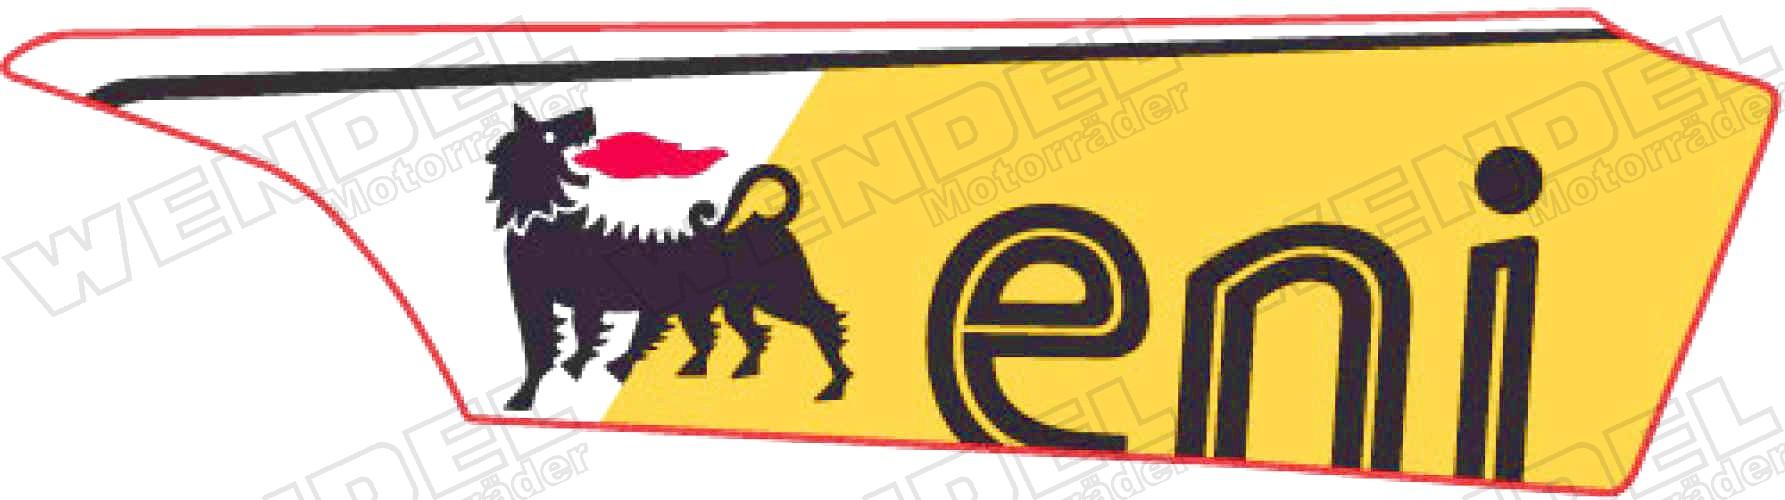 Aprilia Sticker Lh Eni B043705